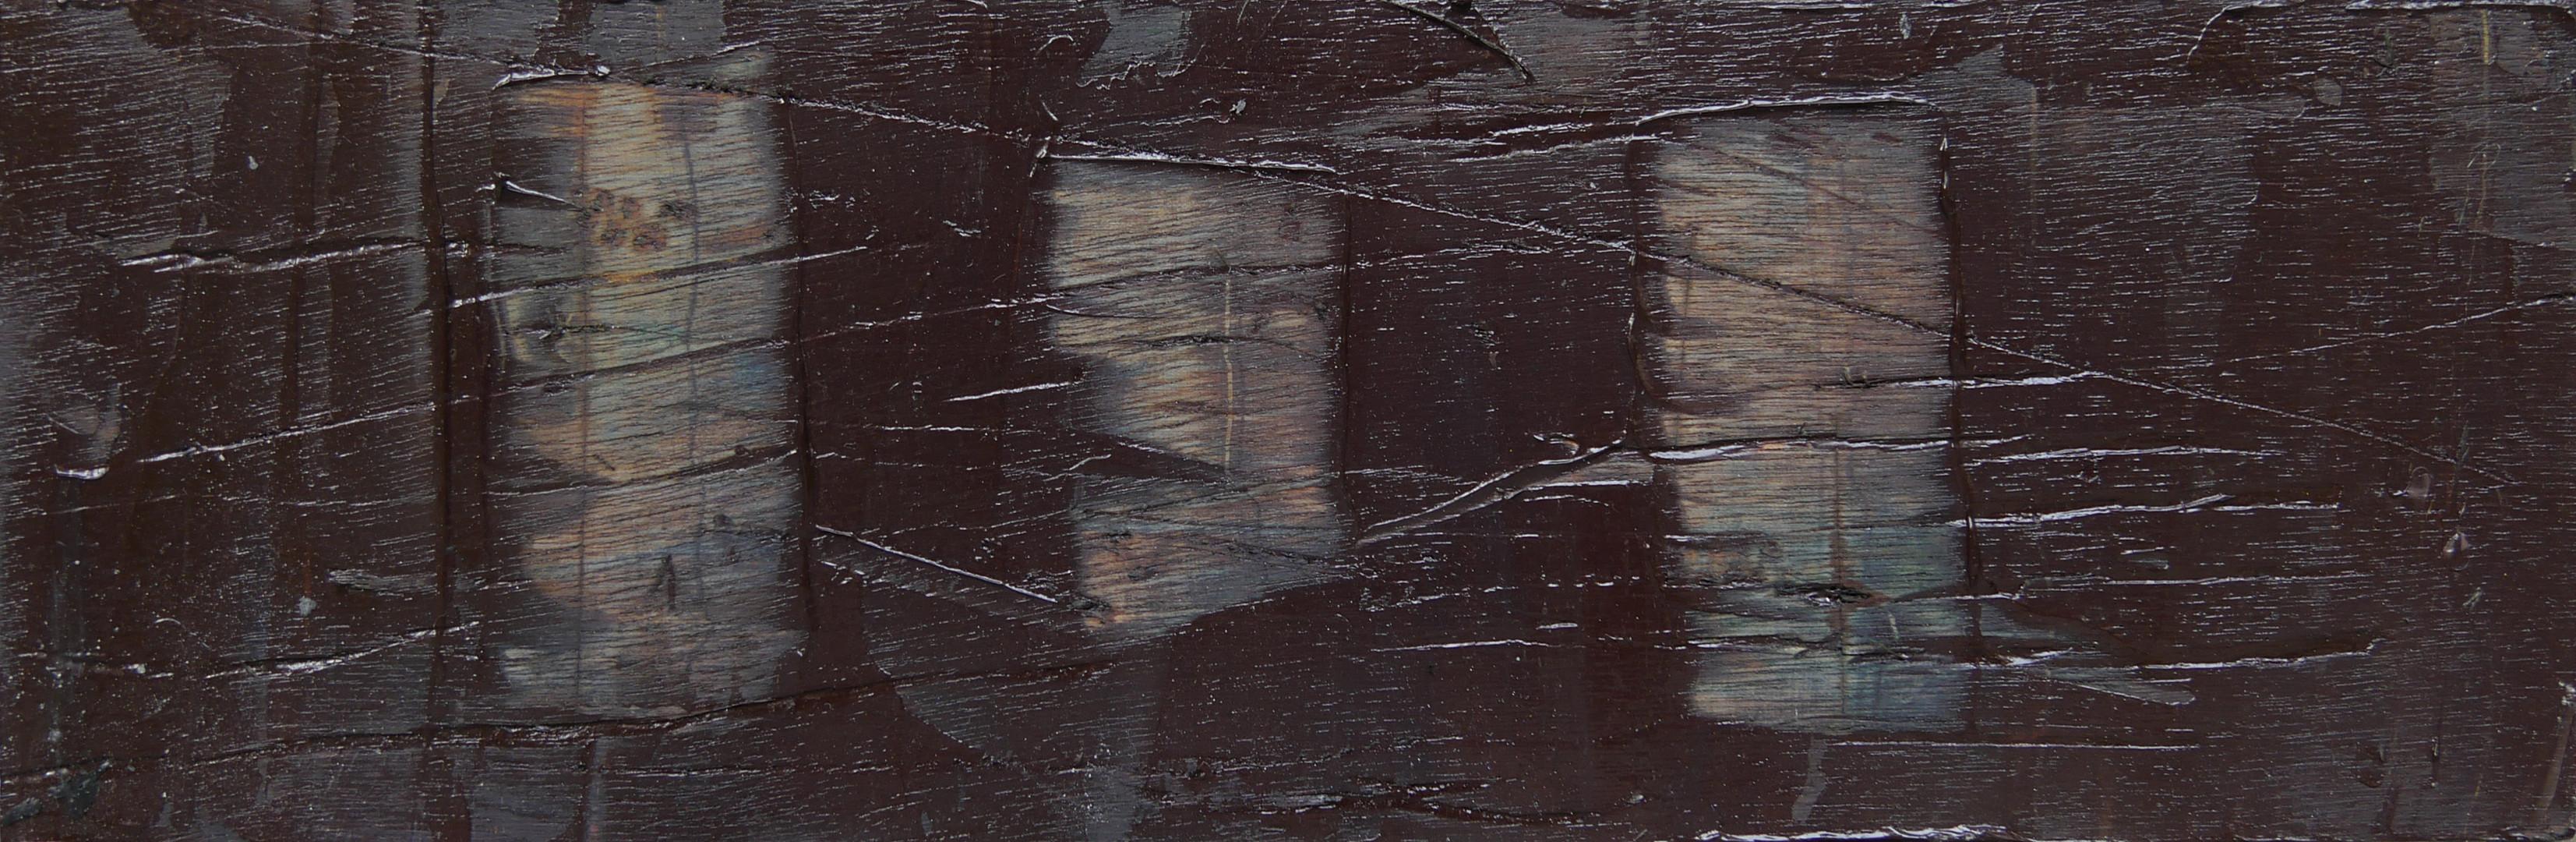 风景 III (paysages) 10x32 cm.jpg